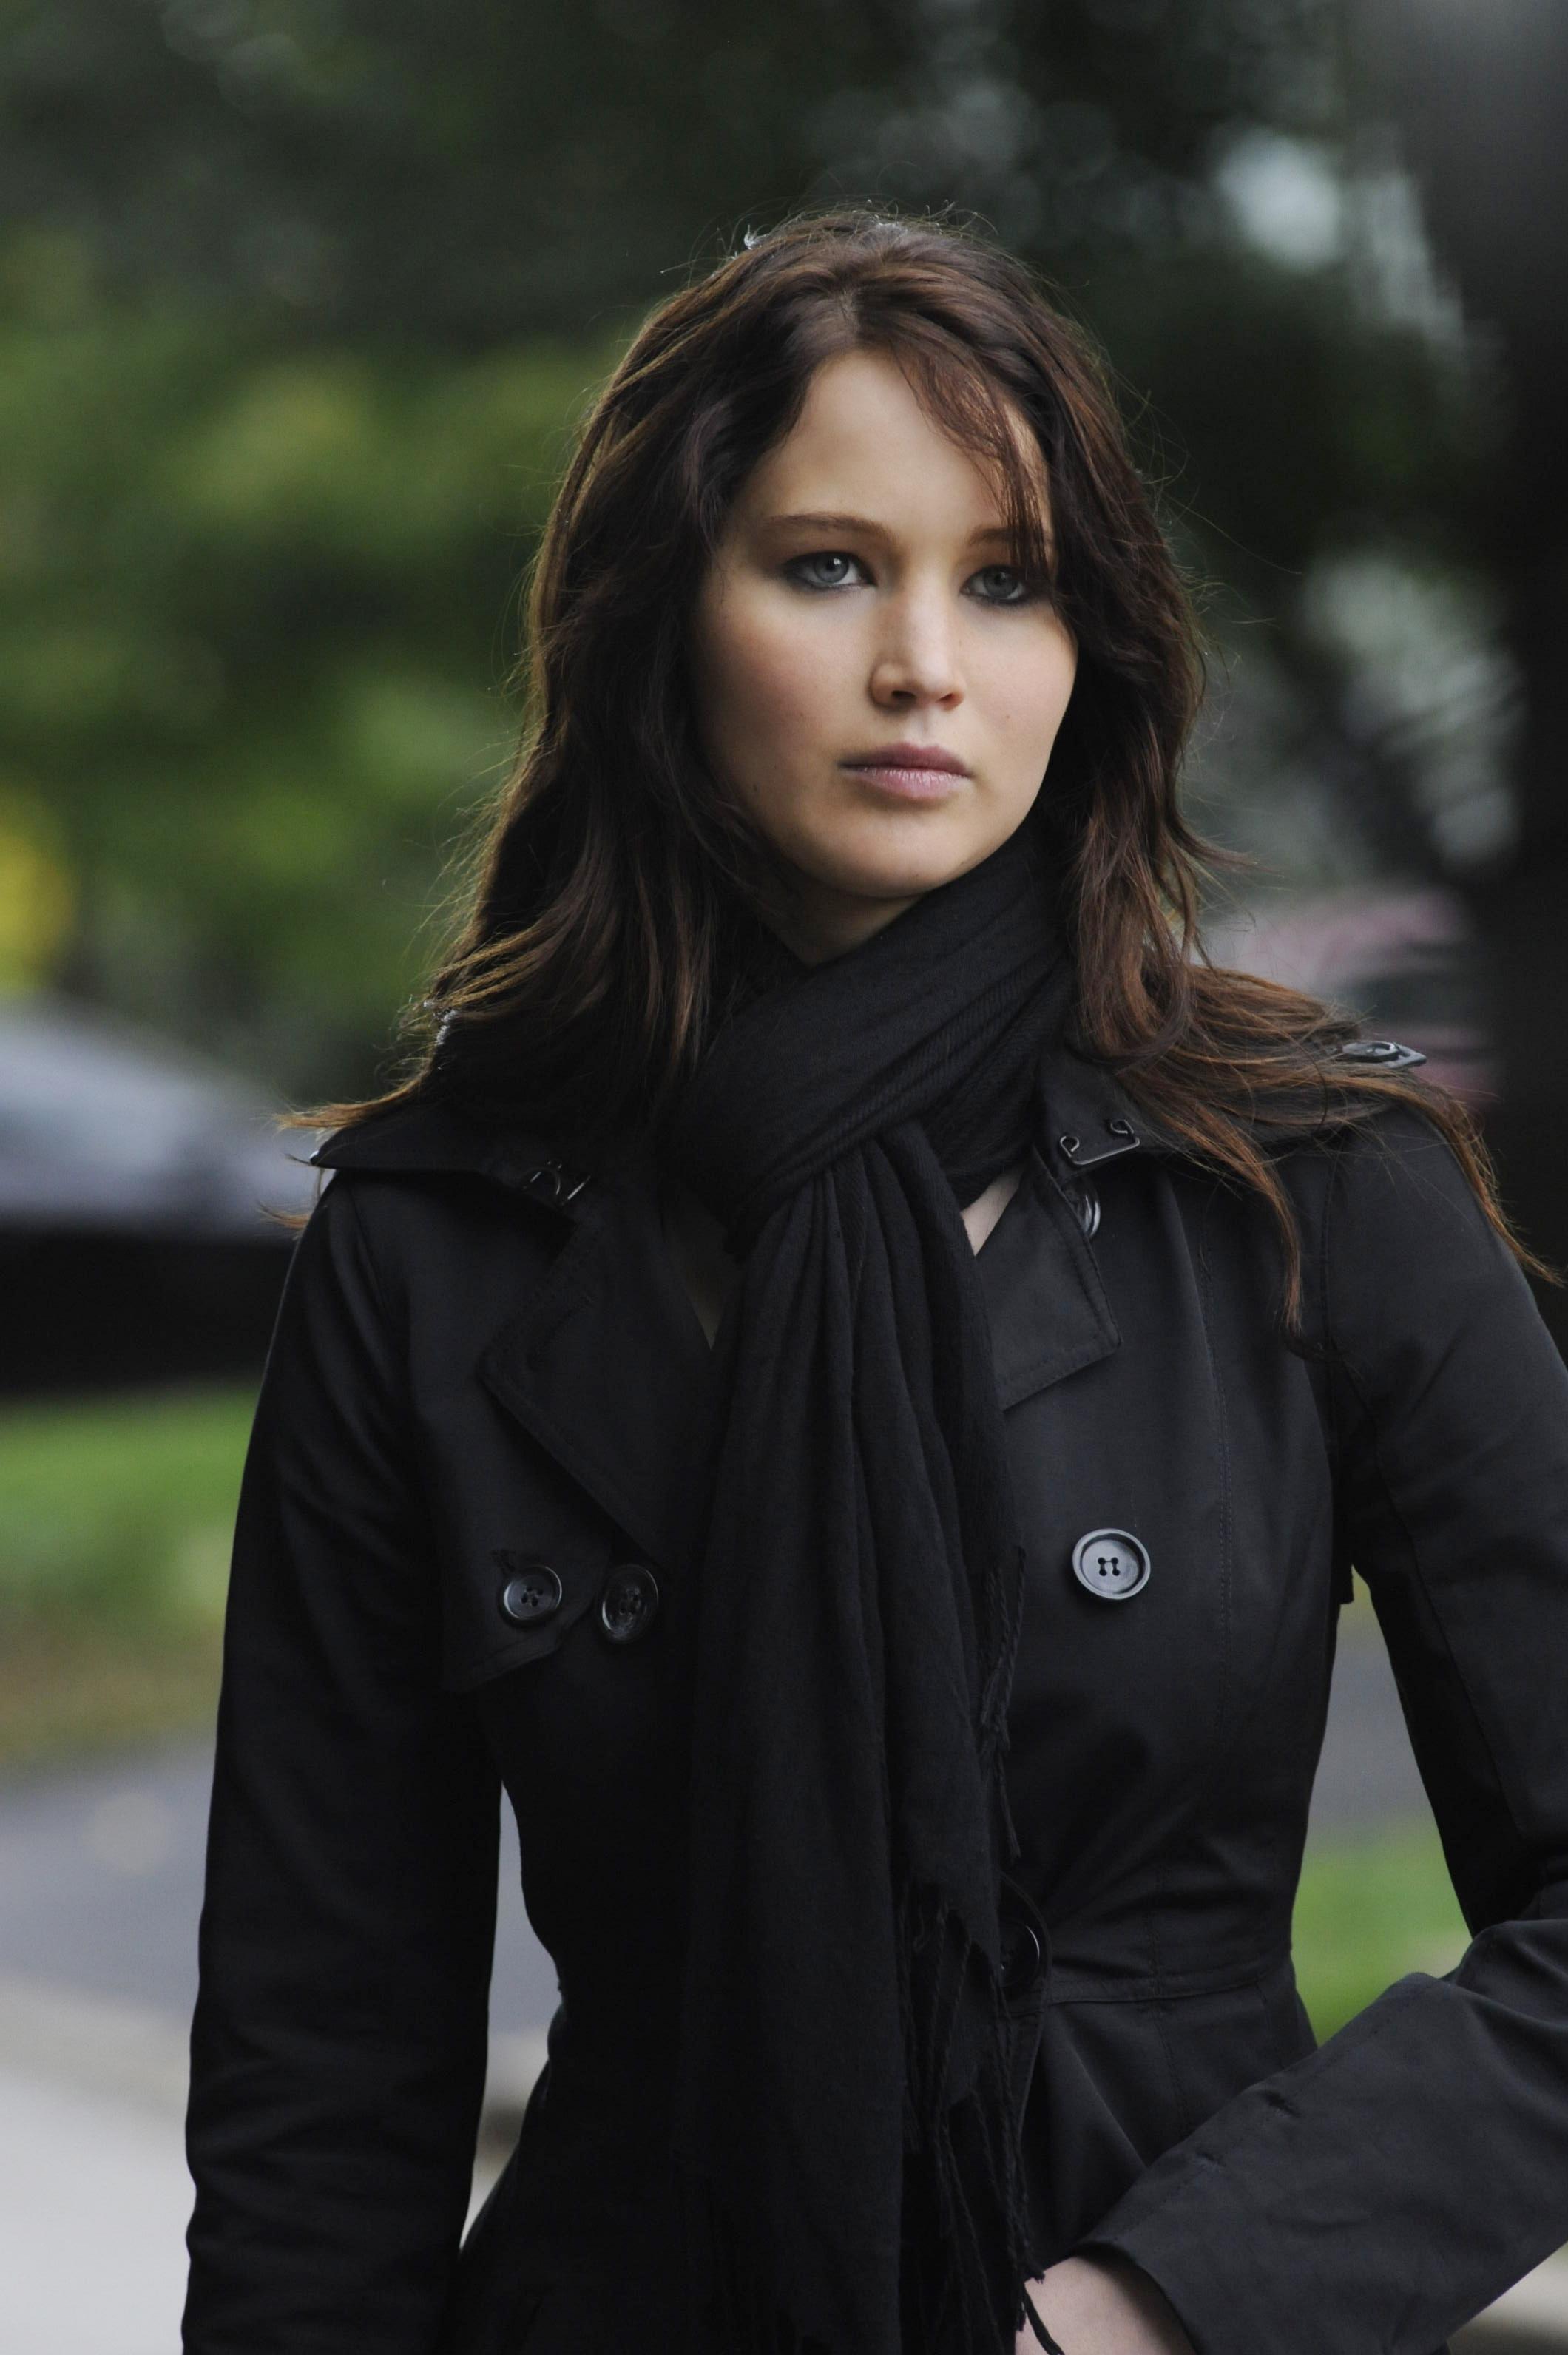 Tessa Blackheart